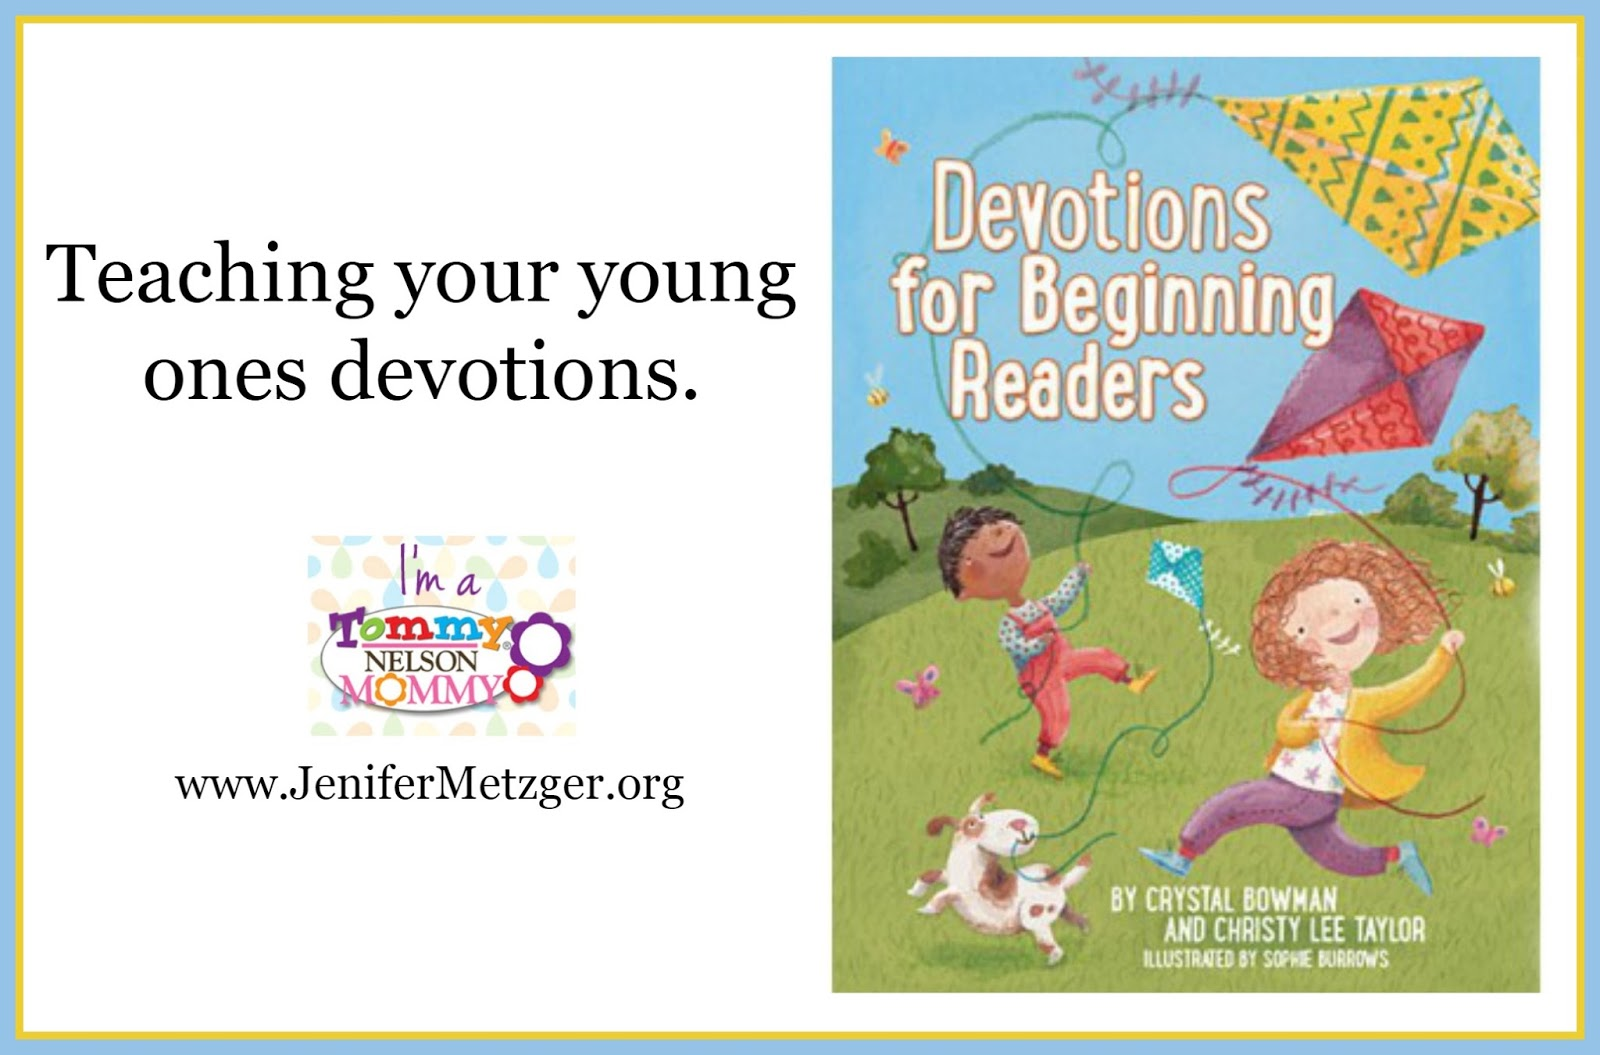 Teaching your young ones devotions. #children #parenting #Bible #devotions